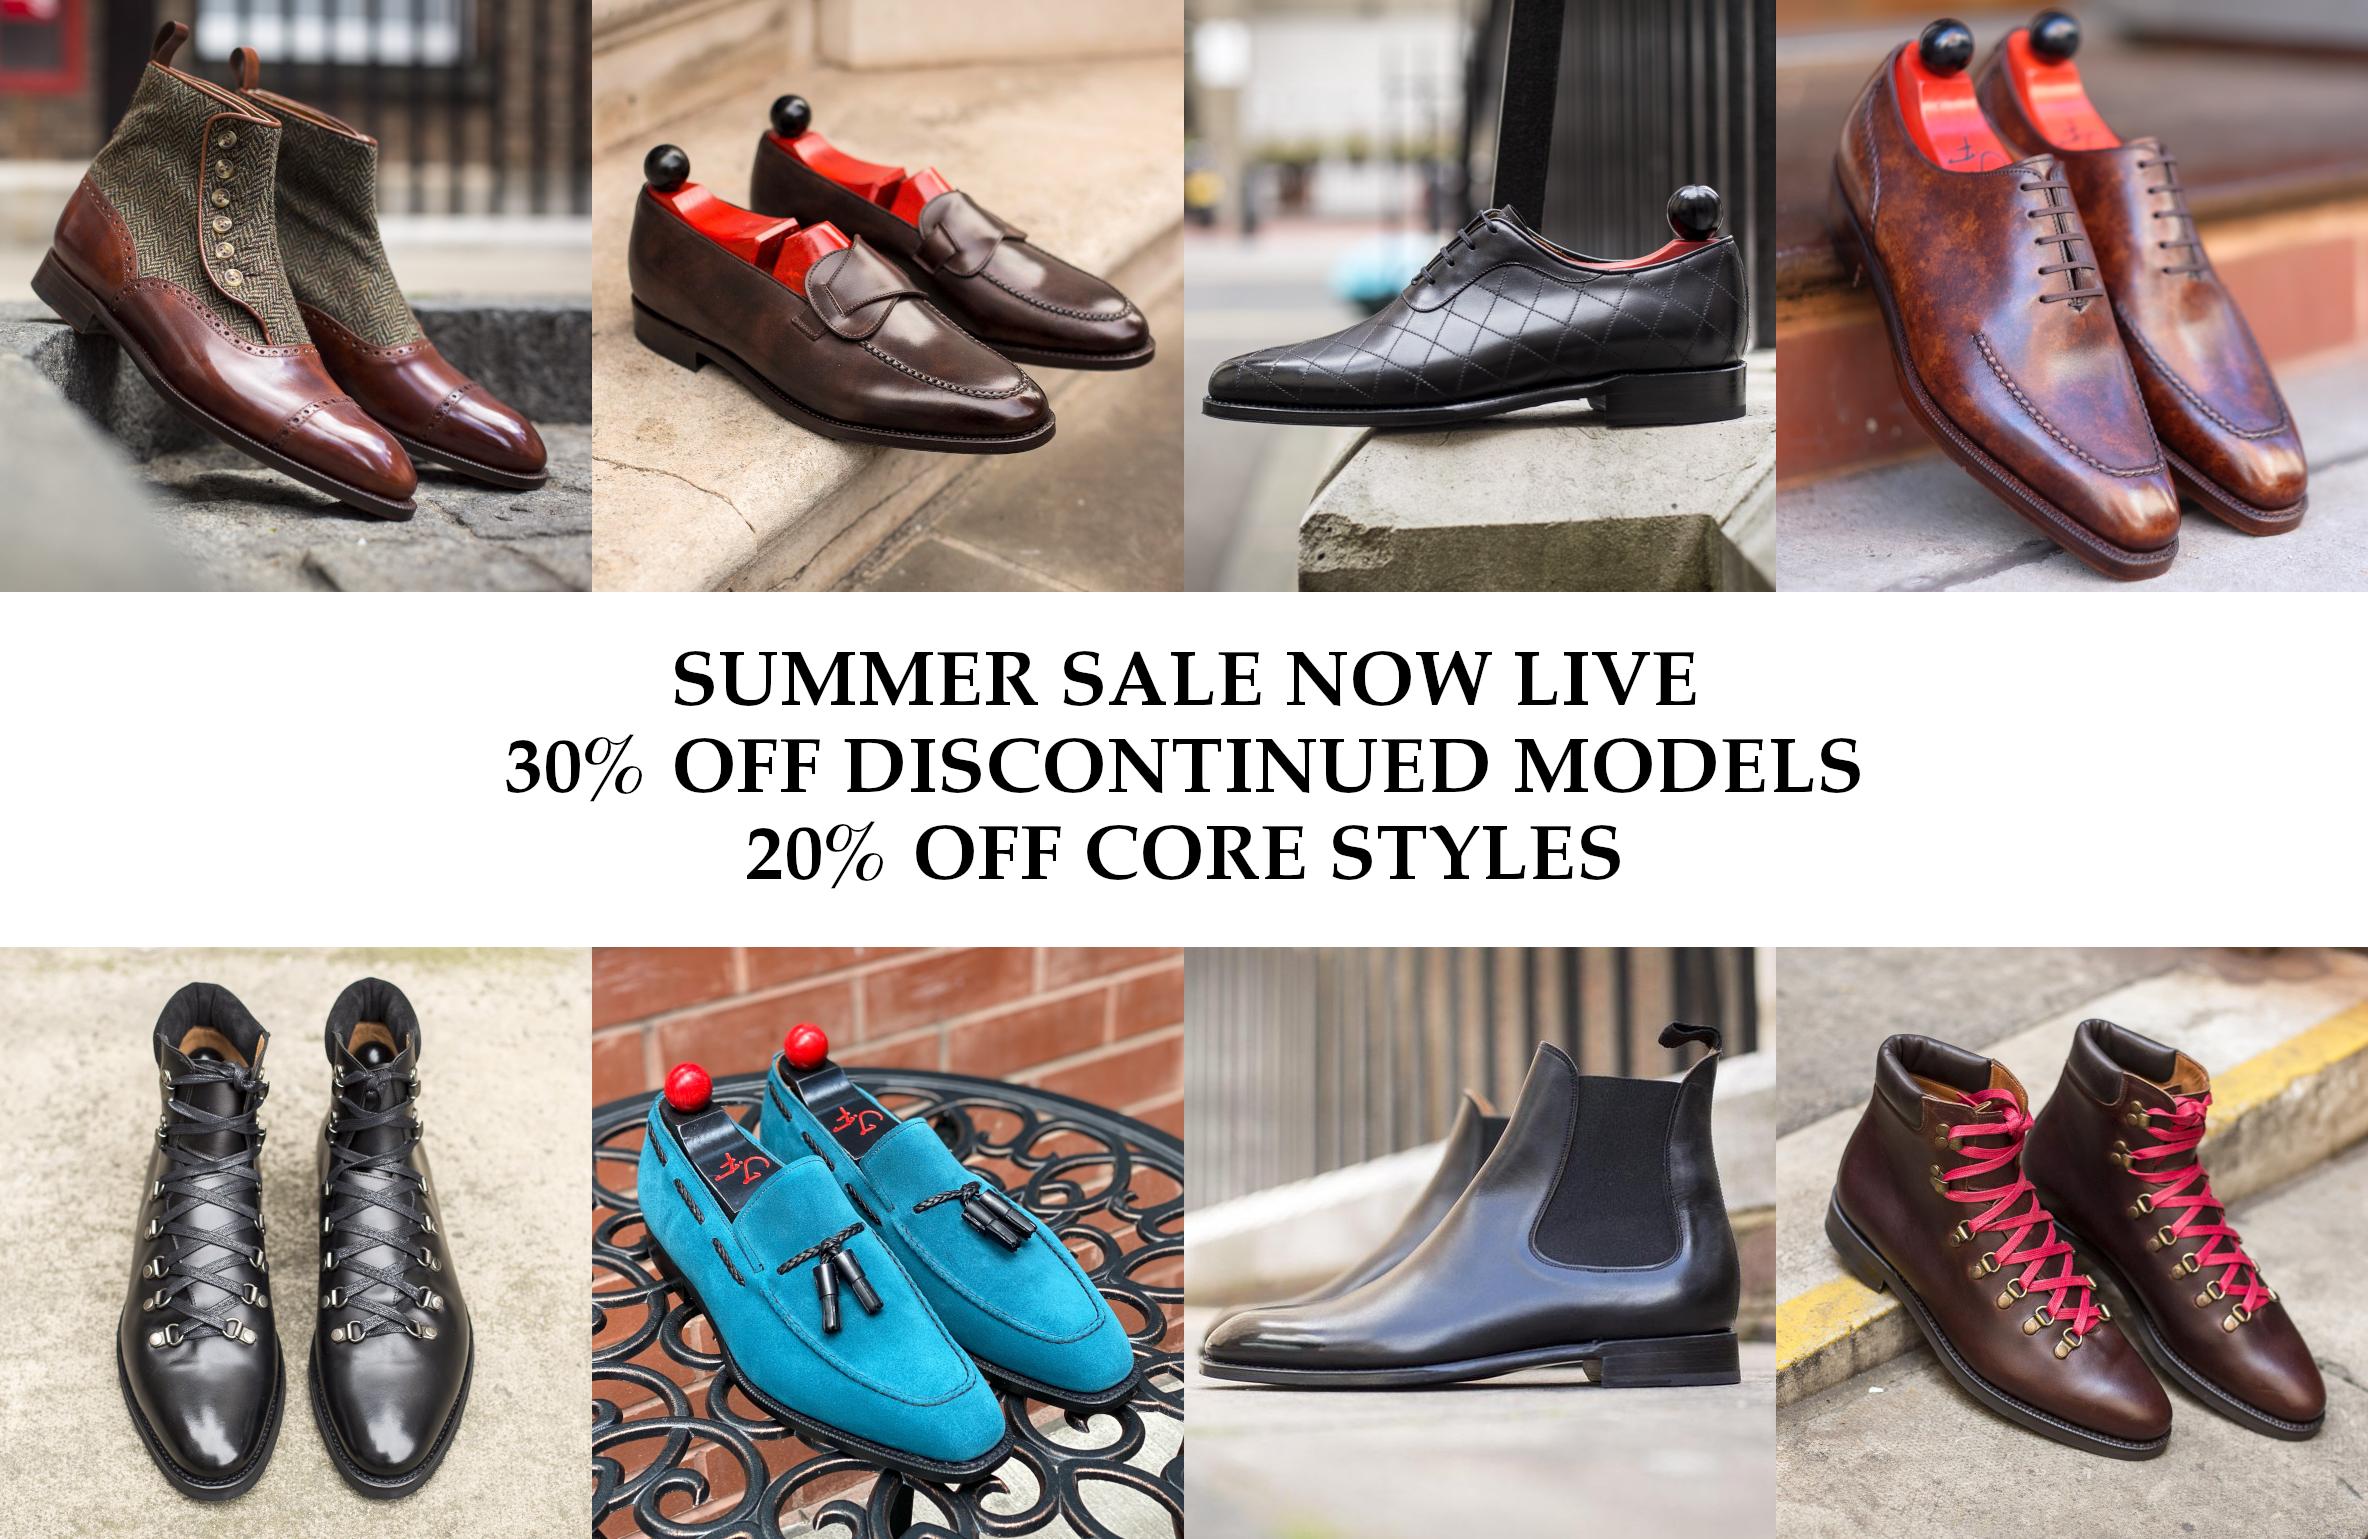 Summer Sale Now Live - J.FitzPatrick Footwear